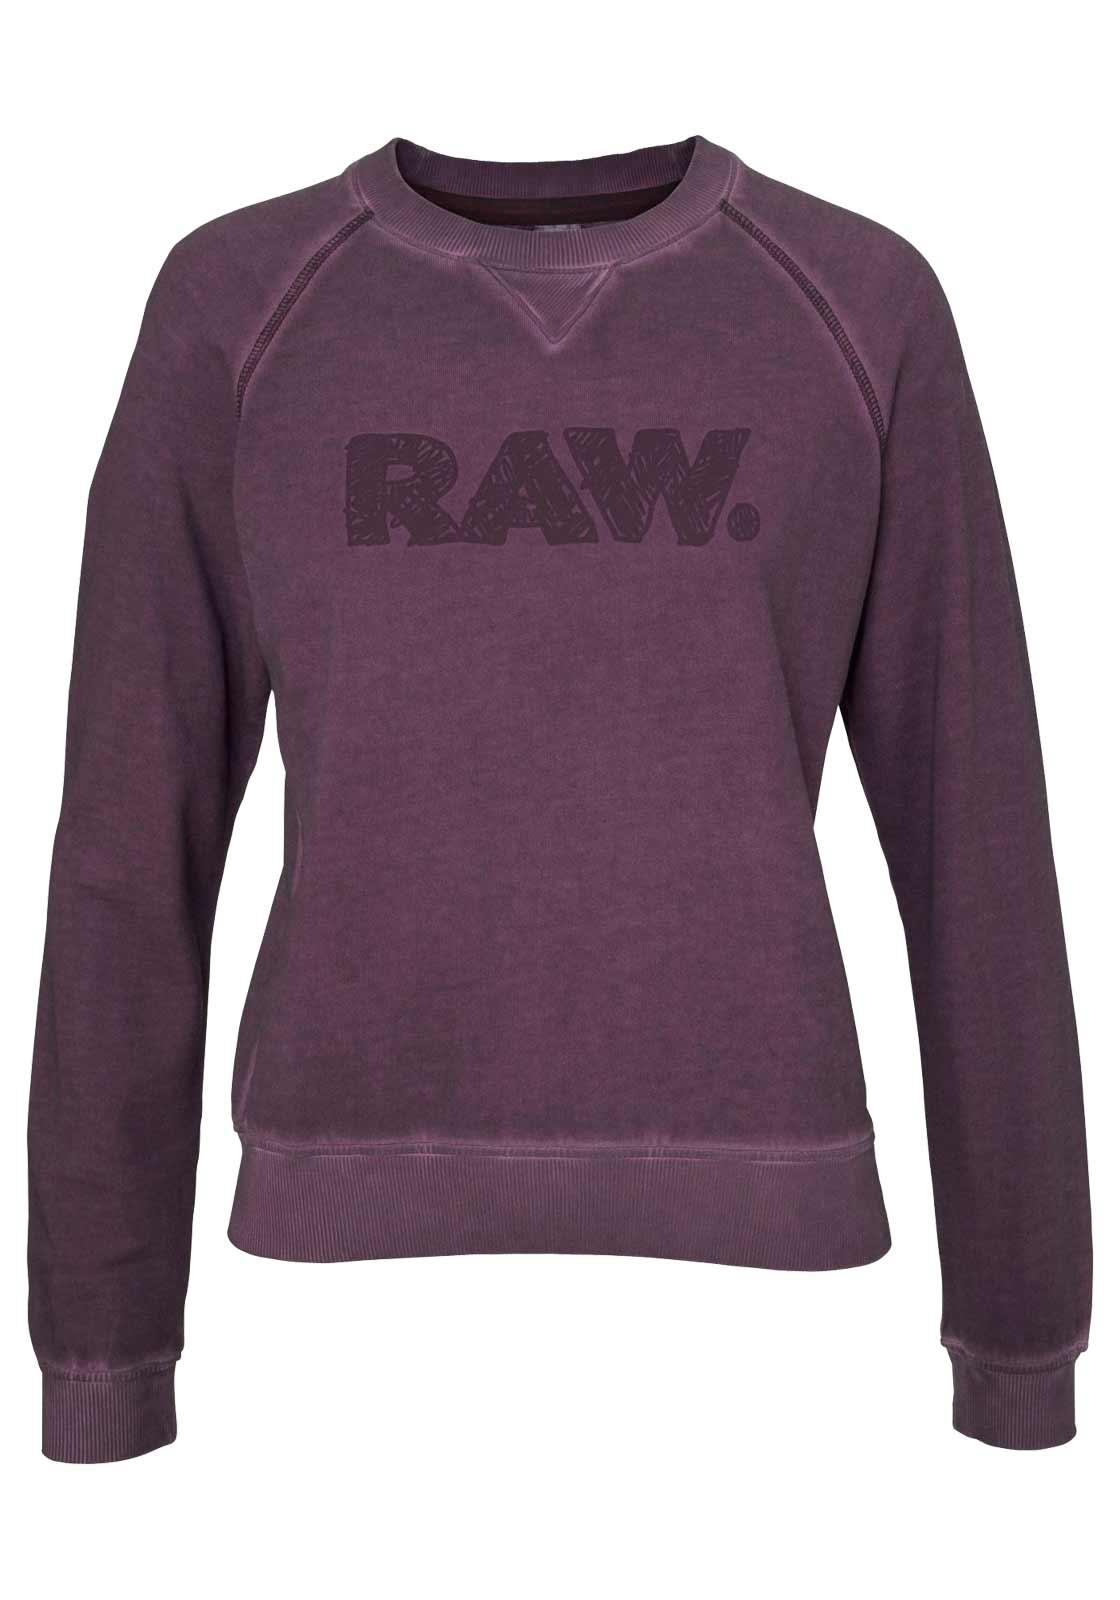 845.884 G-STAR RAW Sweatshirt bordeaux-used